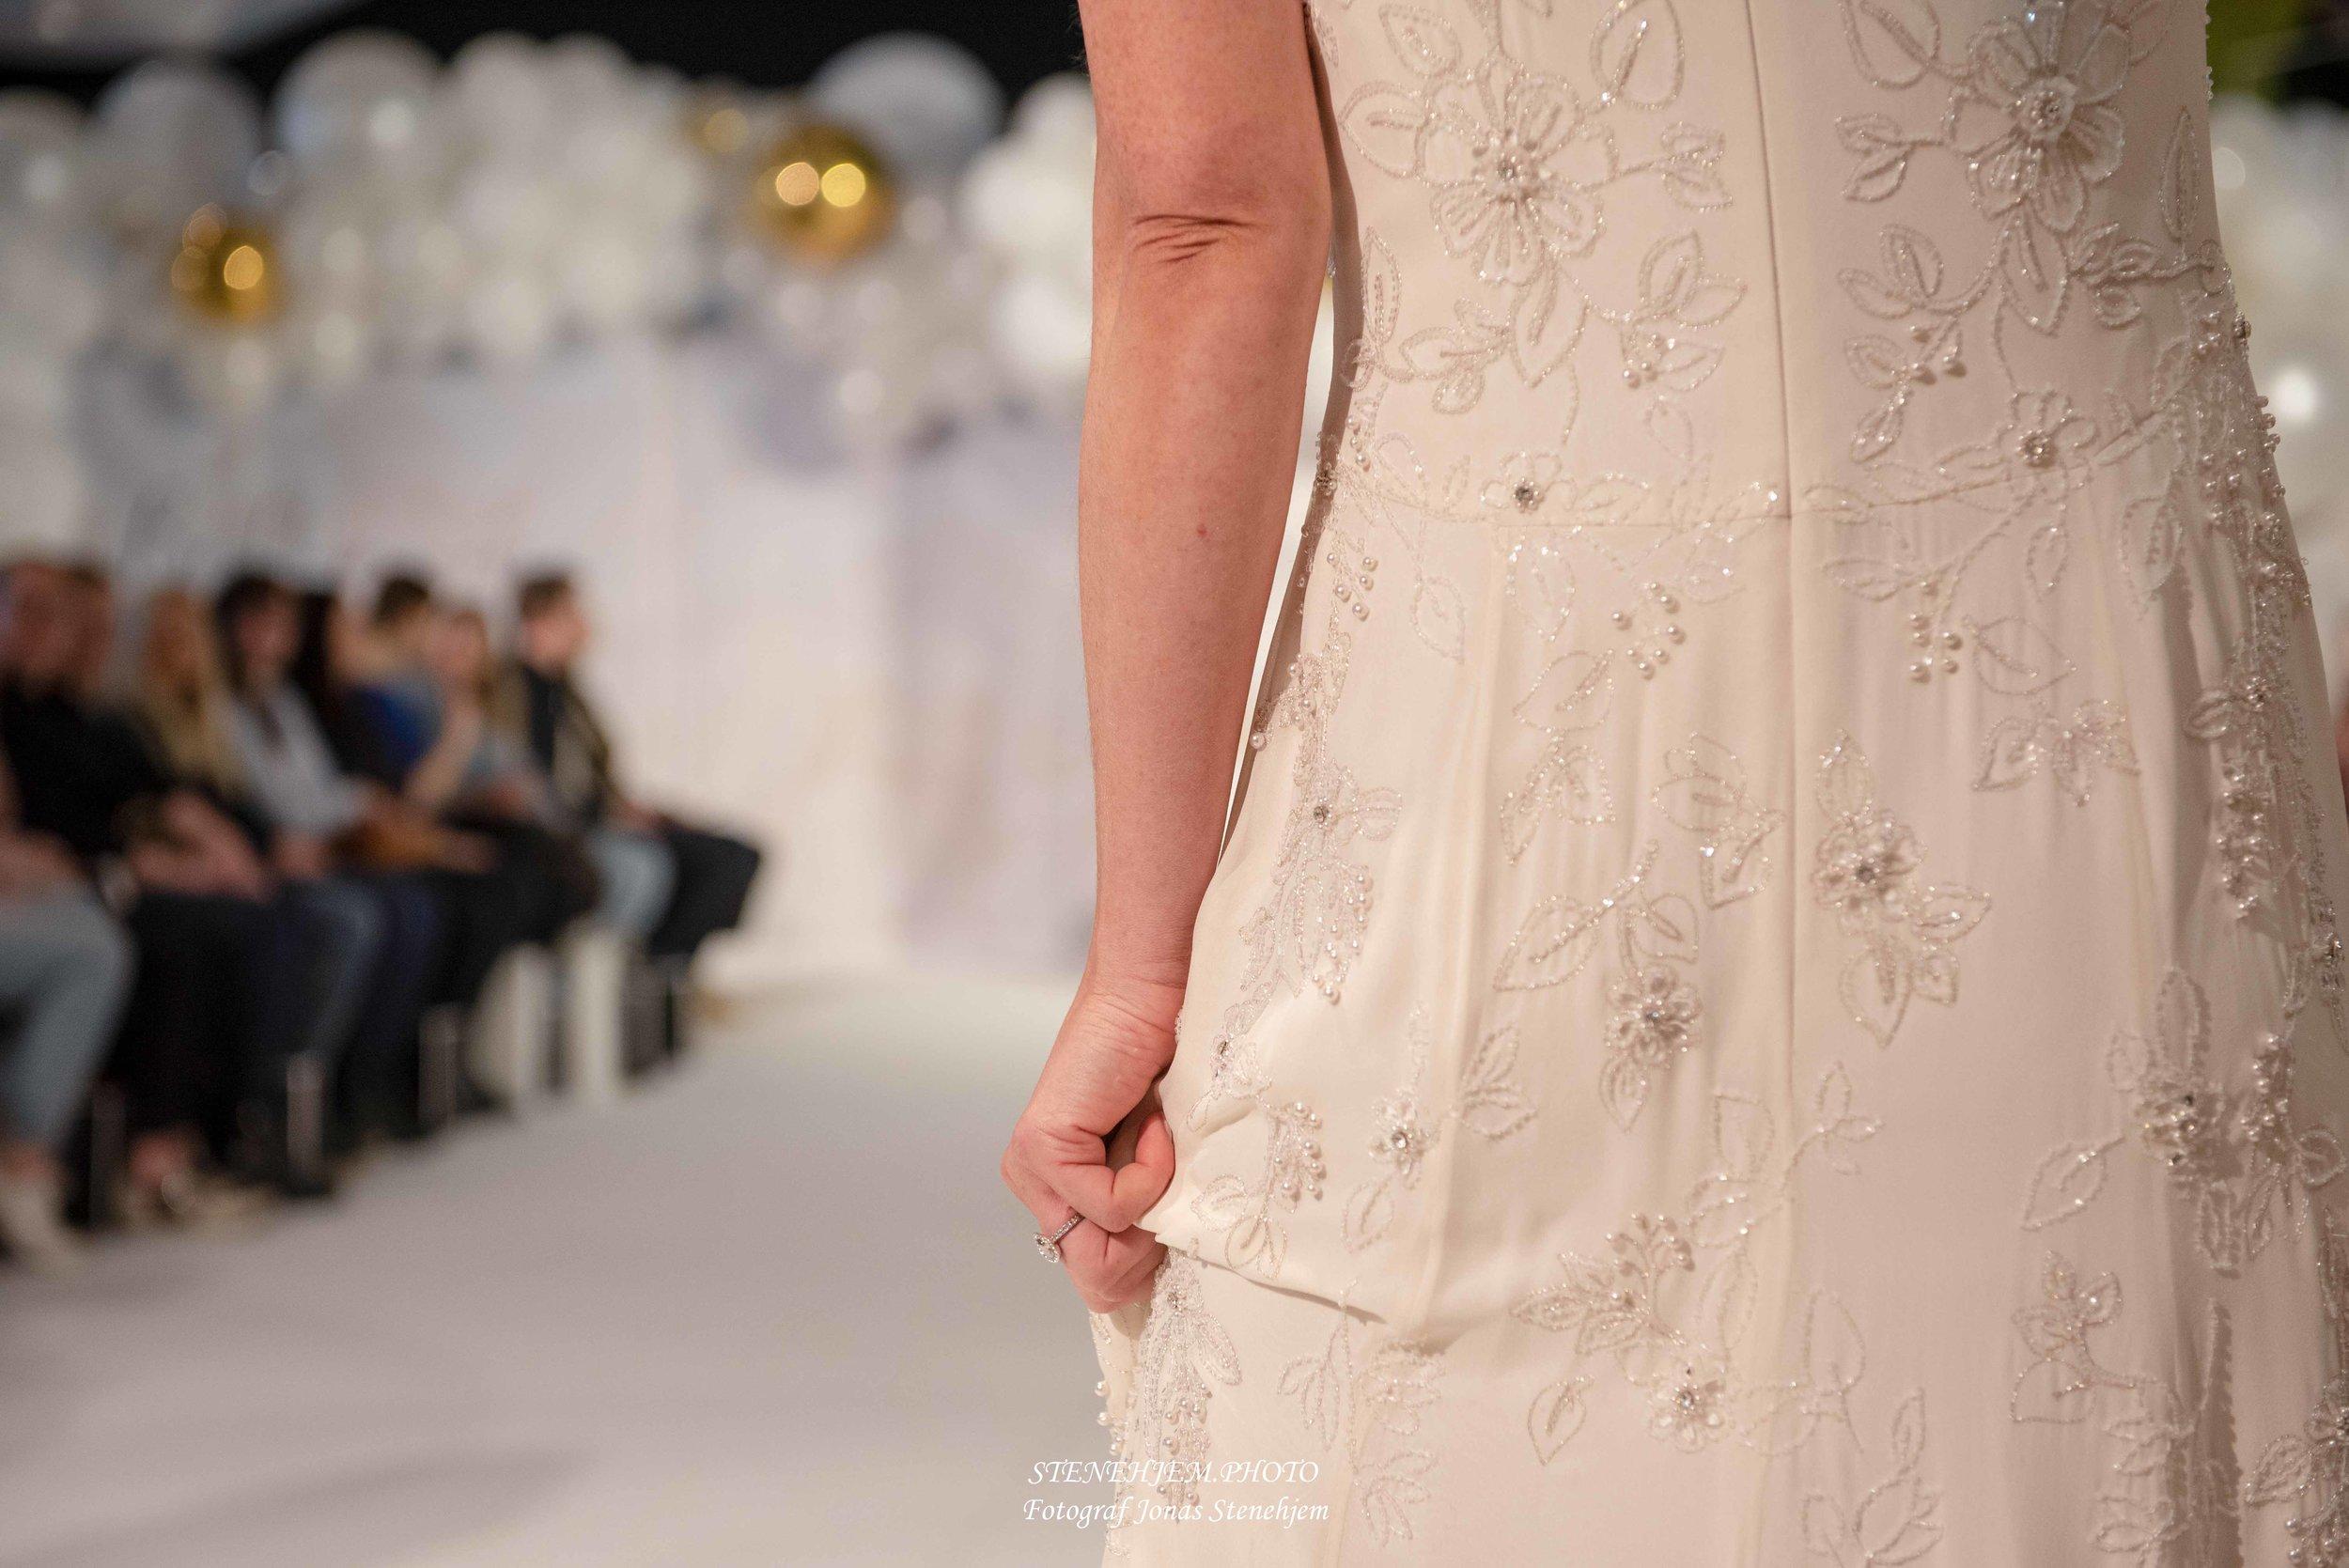 Bryllupsmesse_Lagunen_mittaltweddingfair__098.jpg